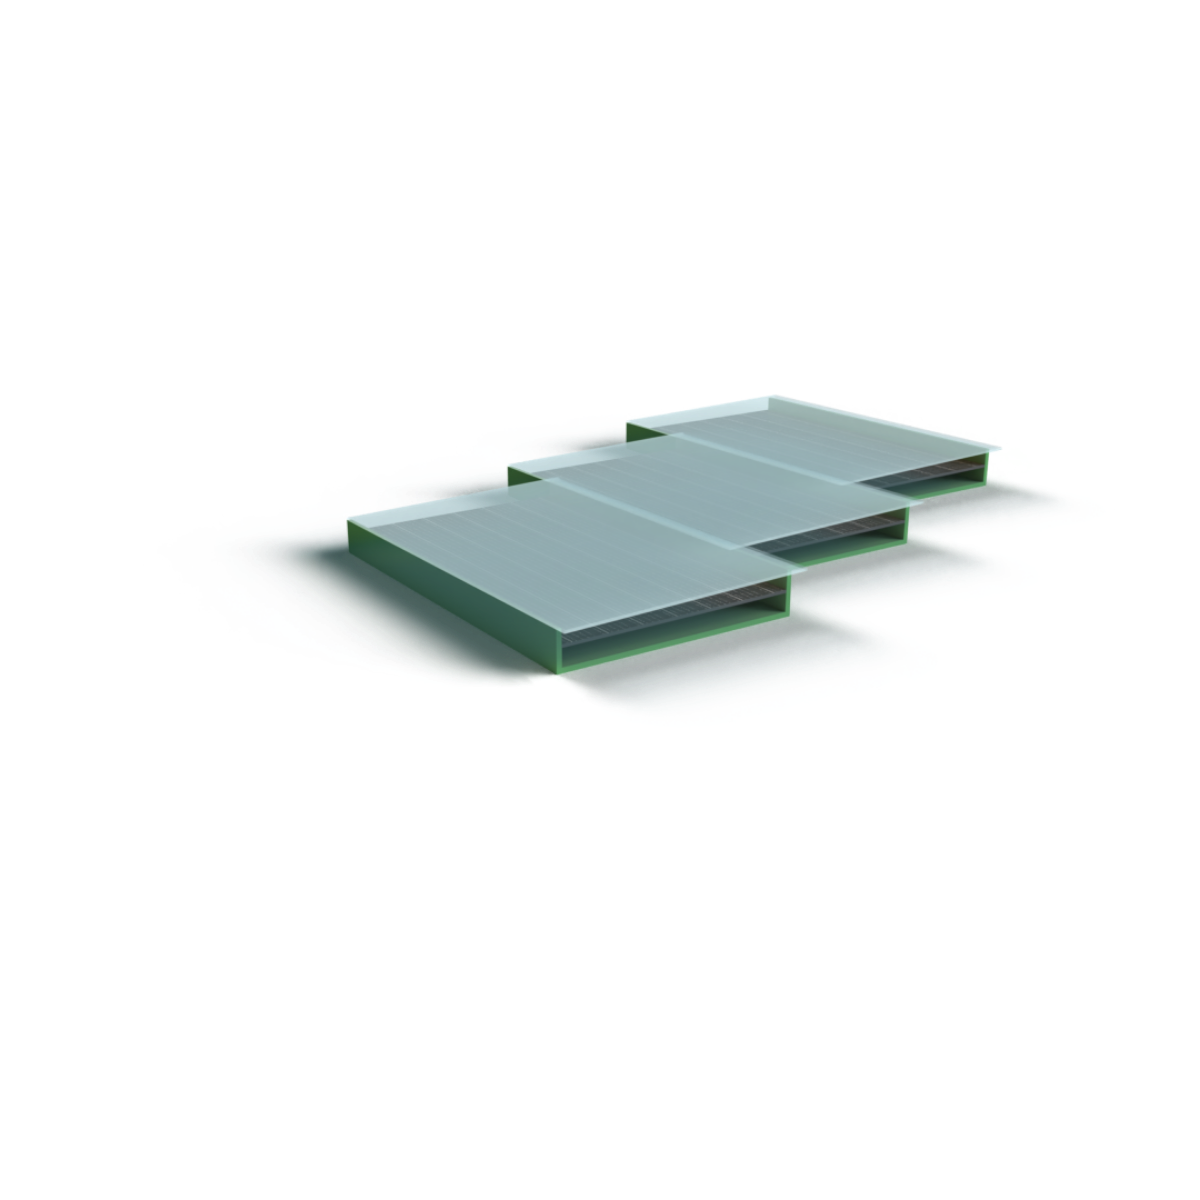 3-D Model of a solar roof tile